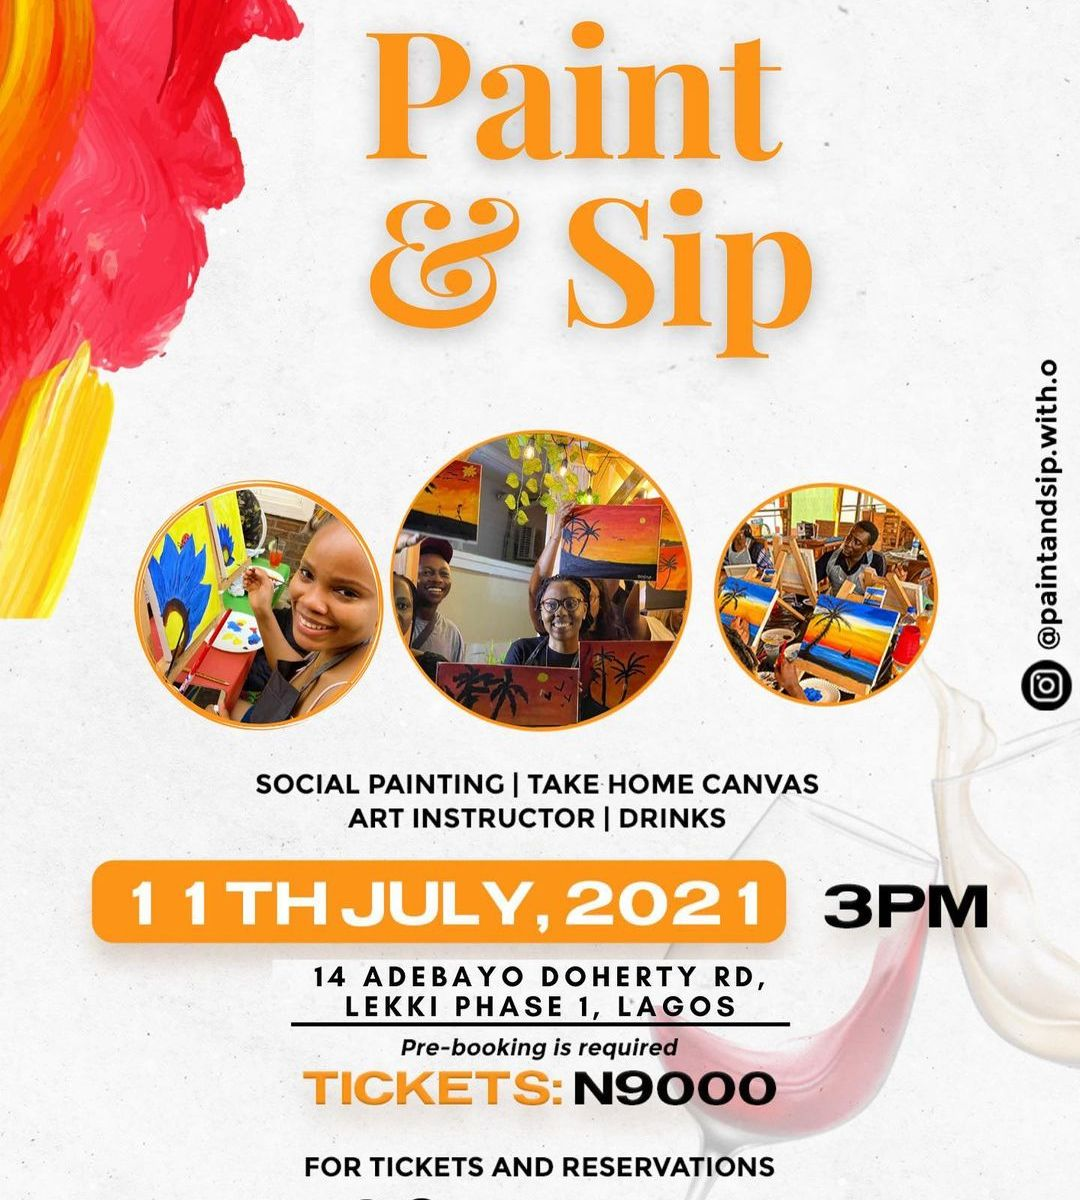 11 Jul. 2021, Paint & Sip